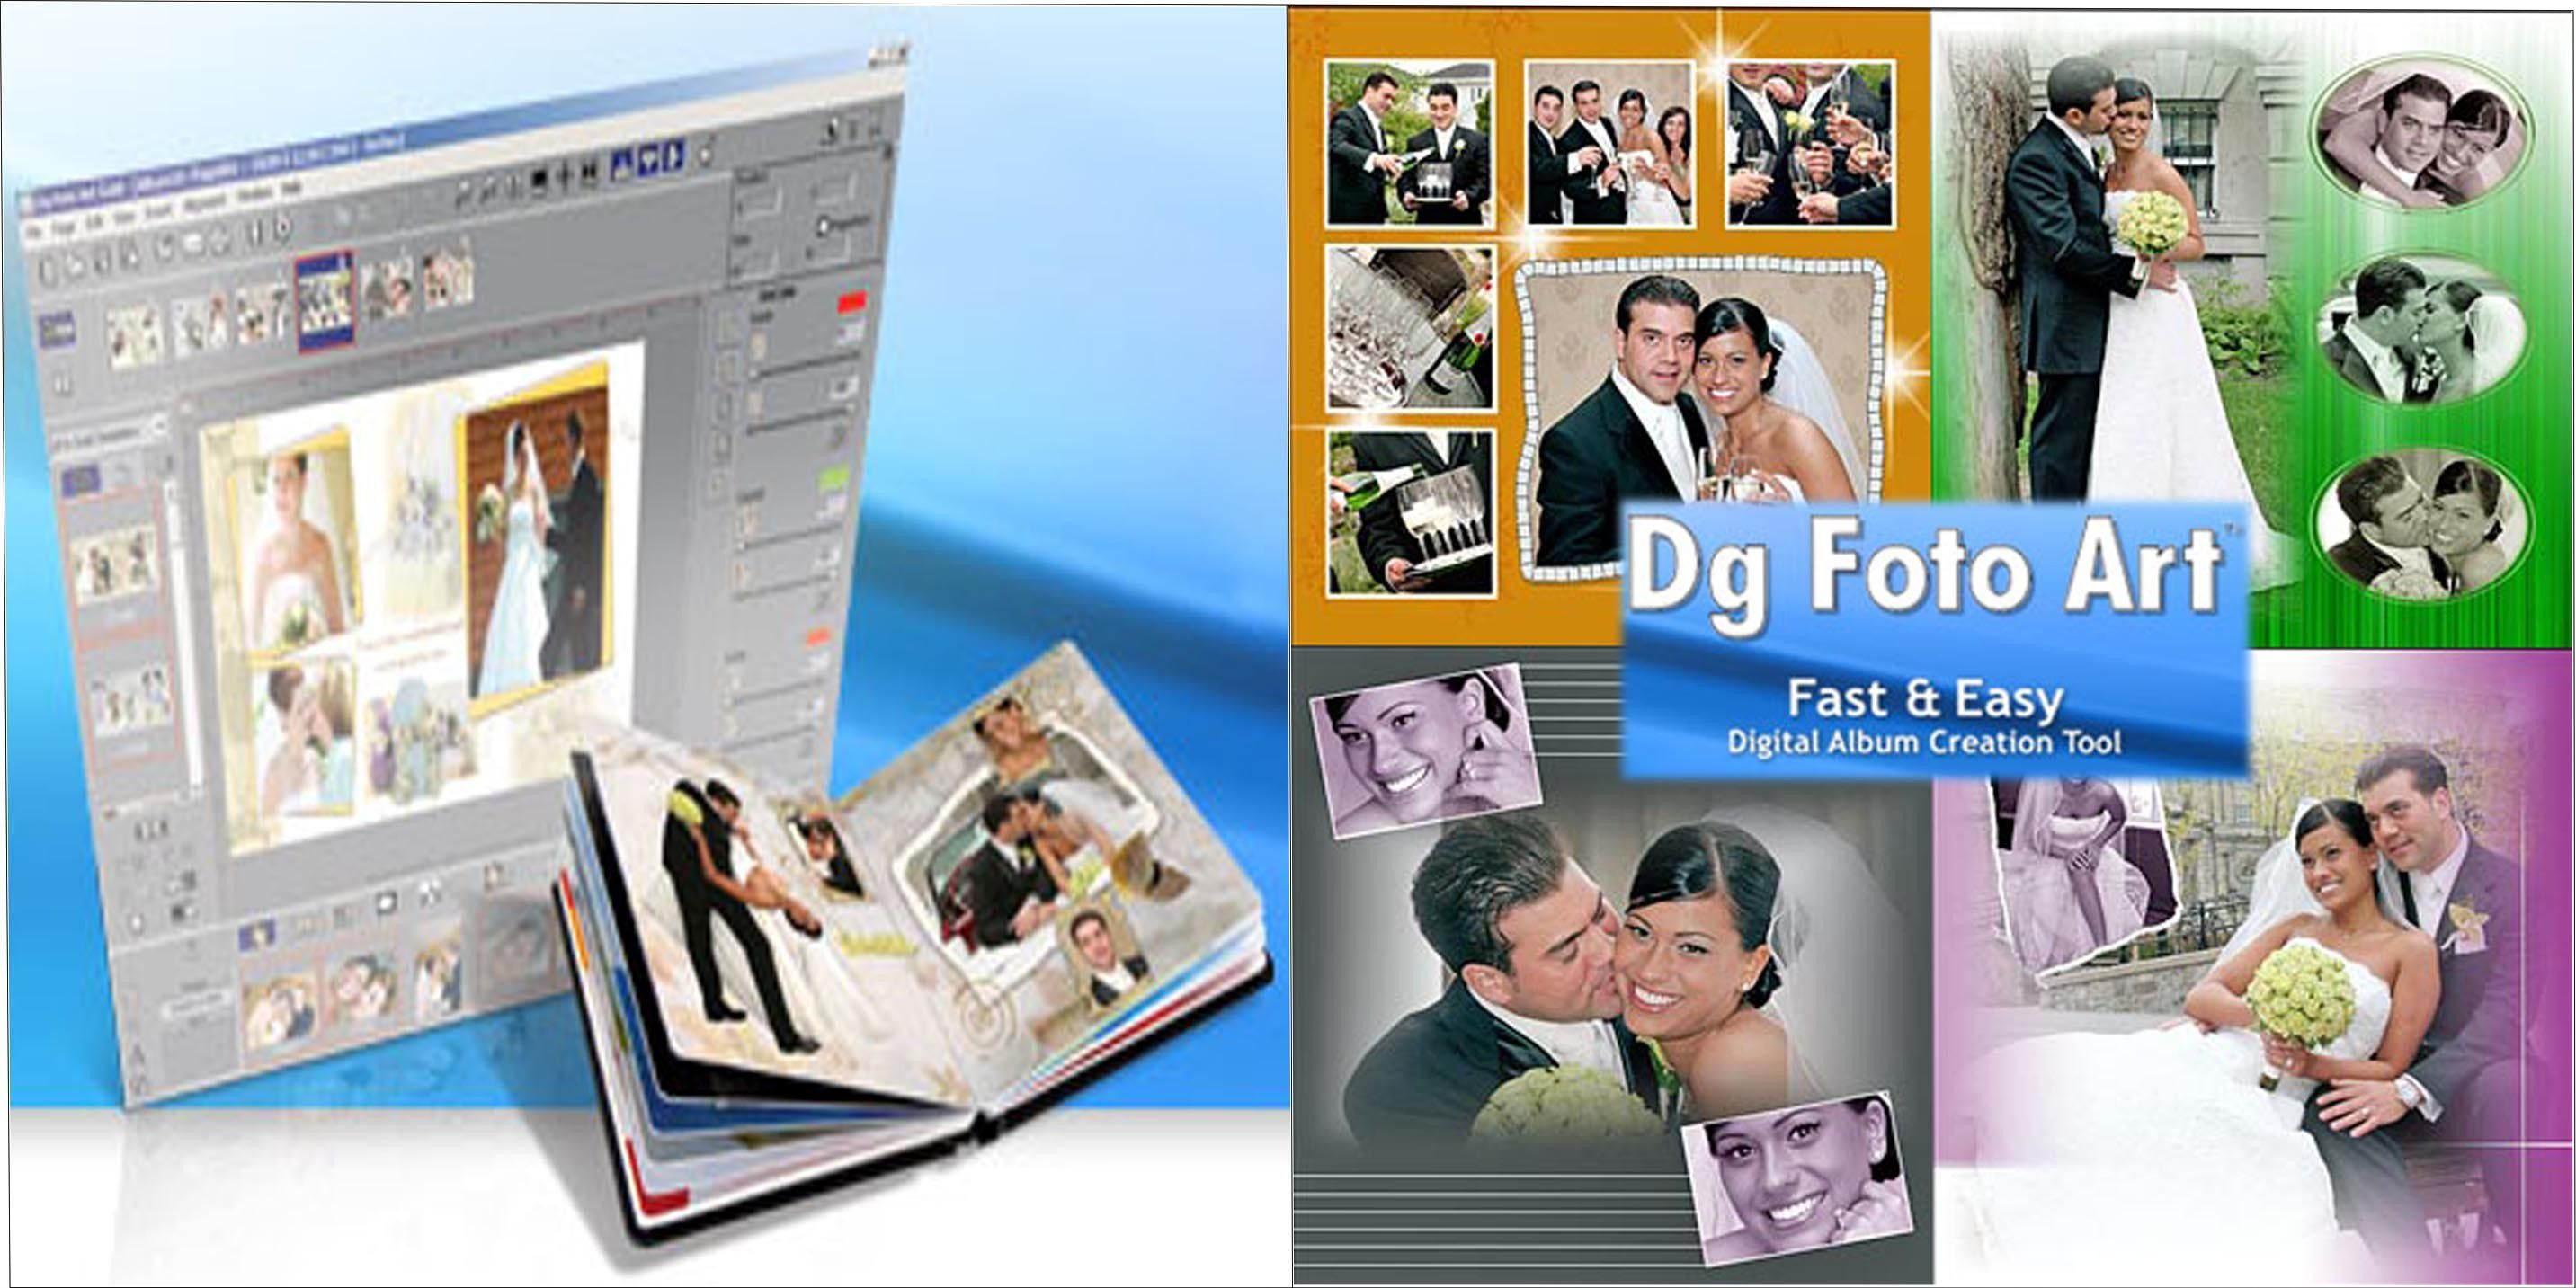 DG Foto Art v5.2 (2006) RUS+ENG PC